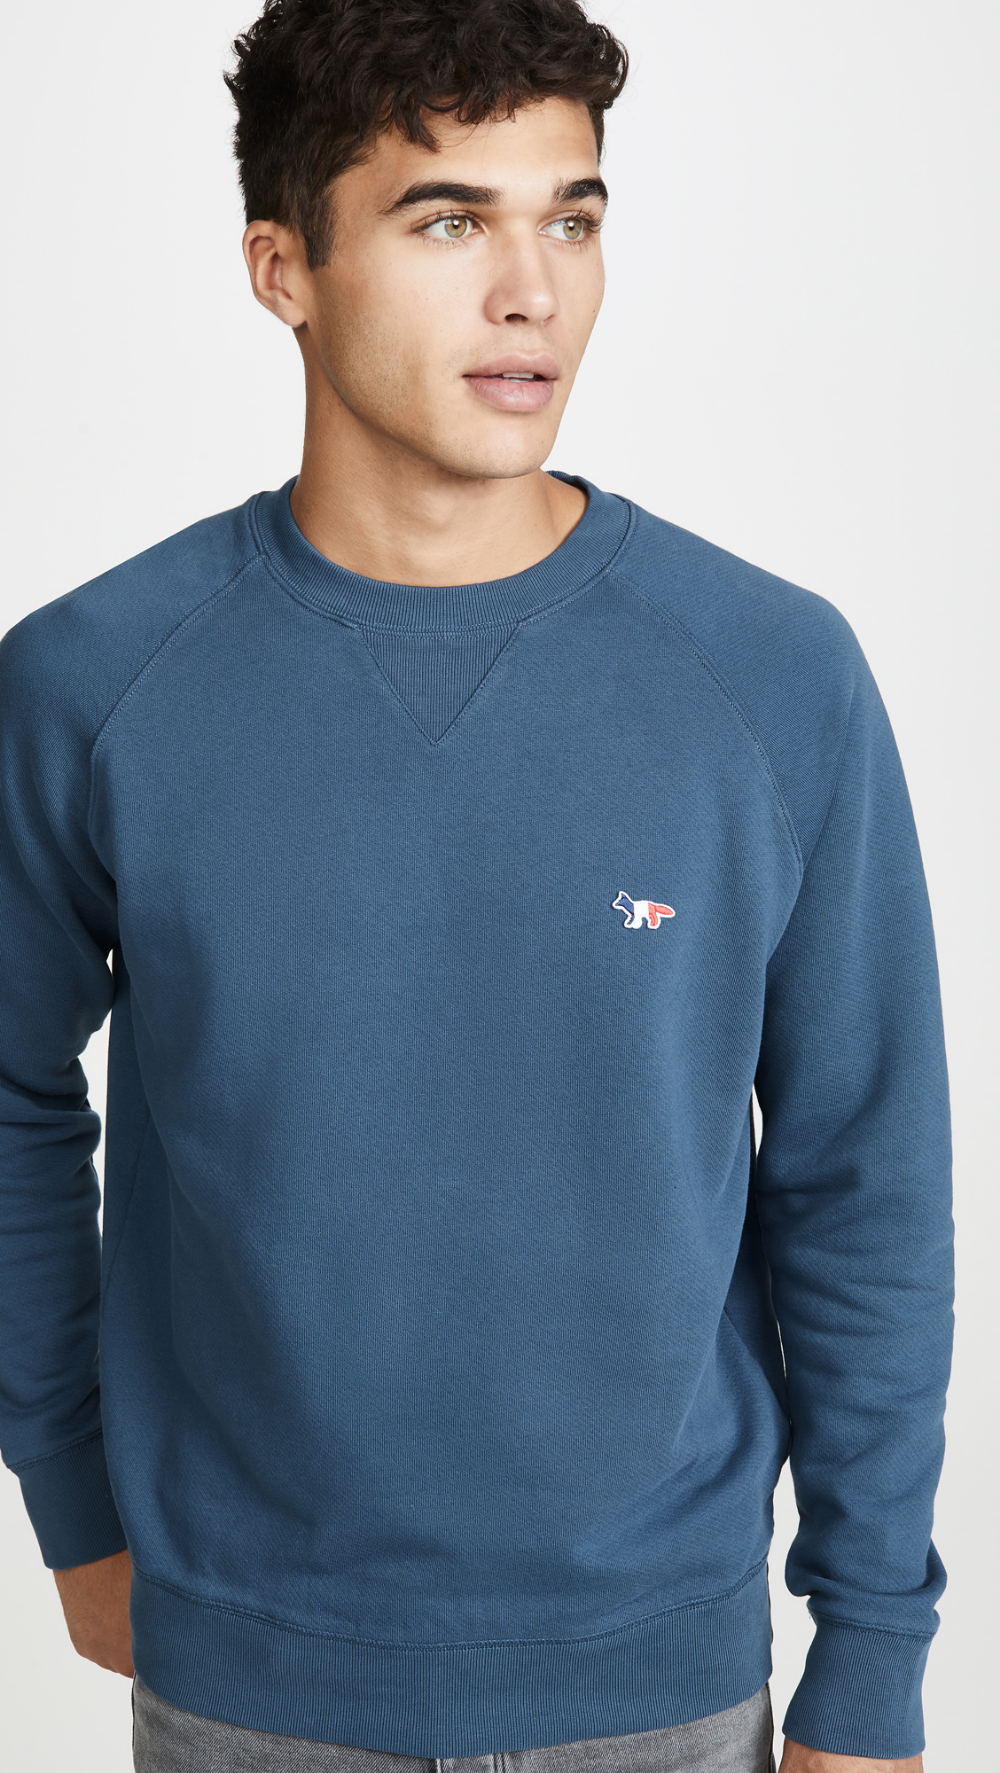 Maison Kitsune Long Sleeve Sweatshirt With Tricolor Fox Patch Long Sleeve Tshirt Men Long Sleeve Sweatshirts Pullover Styling [ 1773 x 1000 Pixel ]